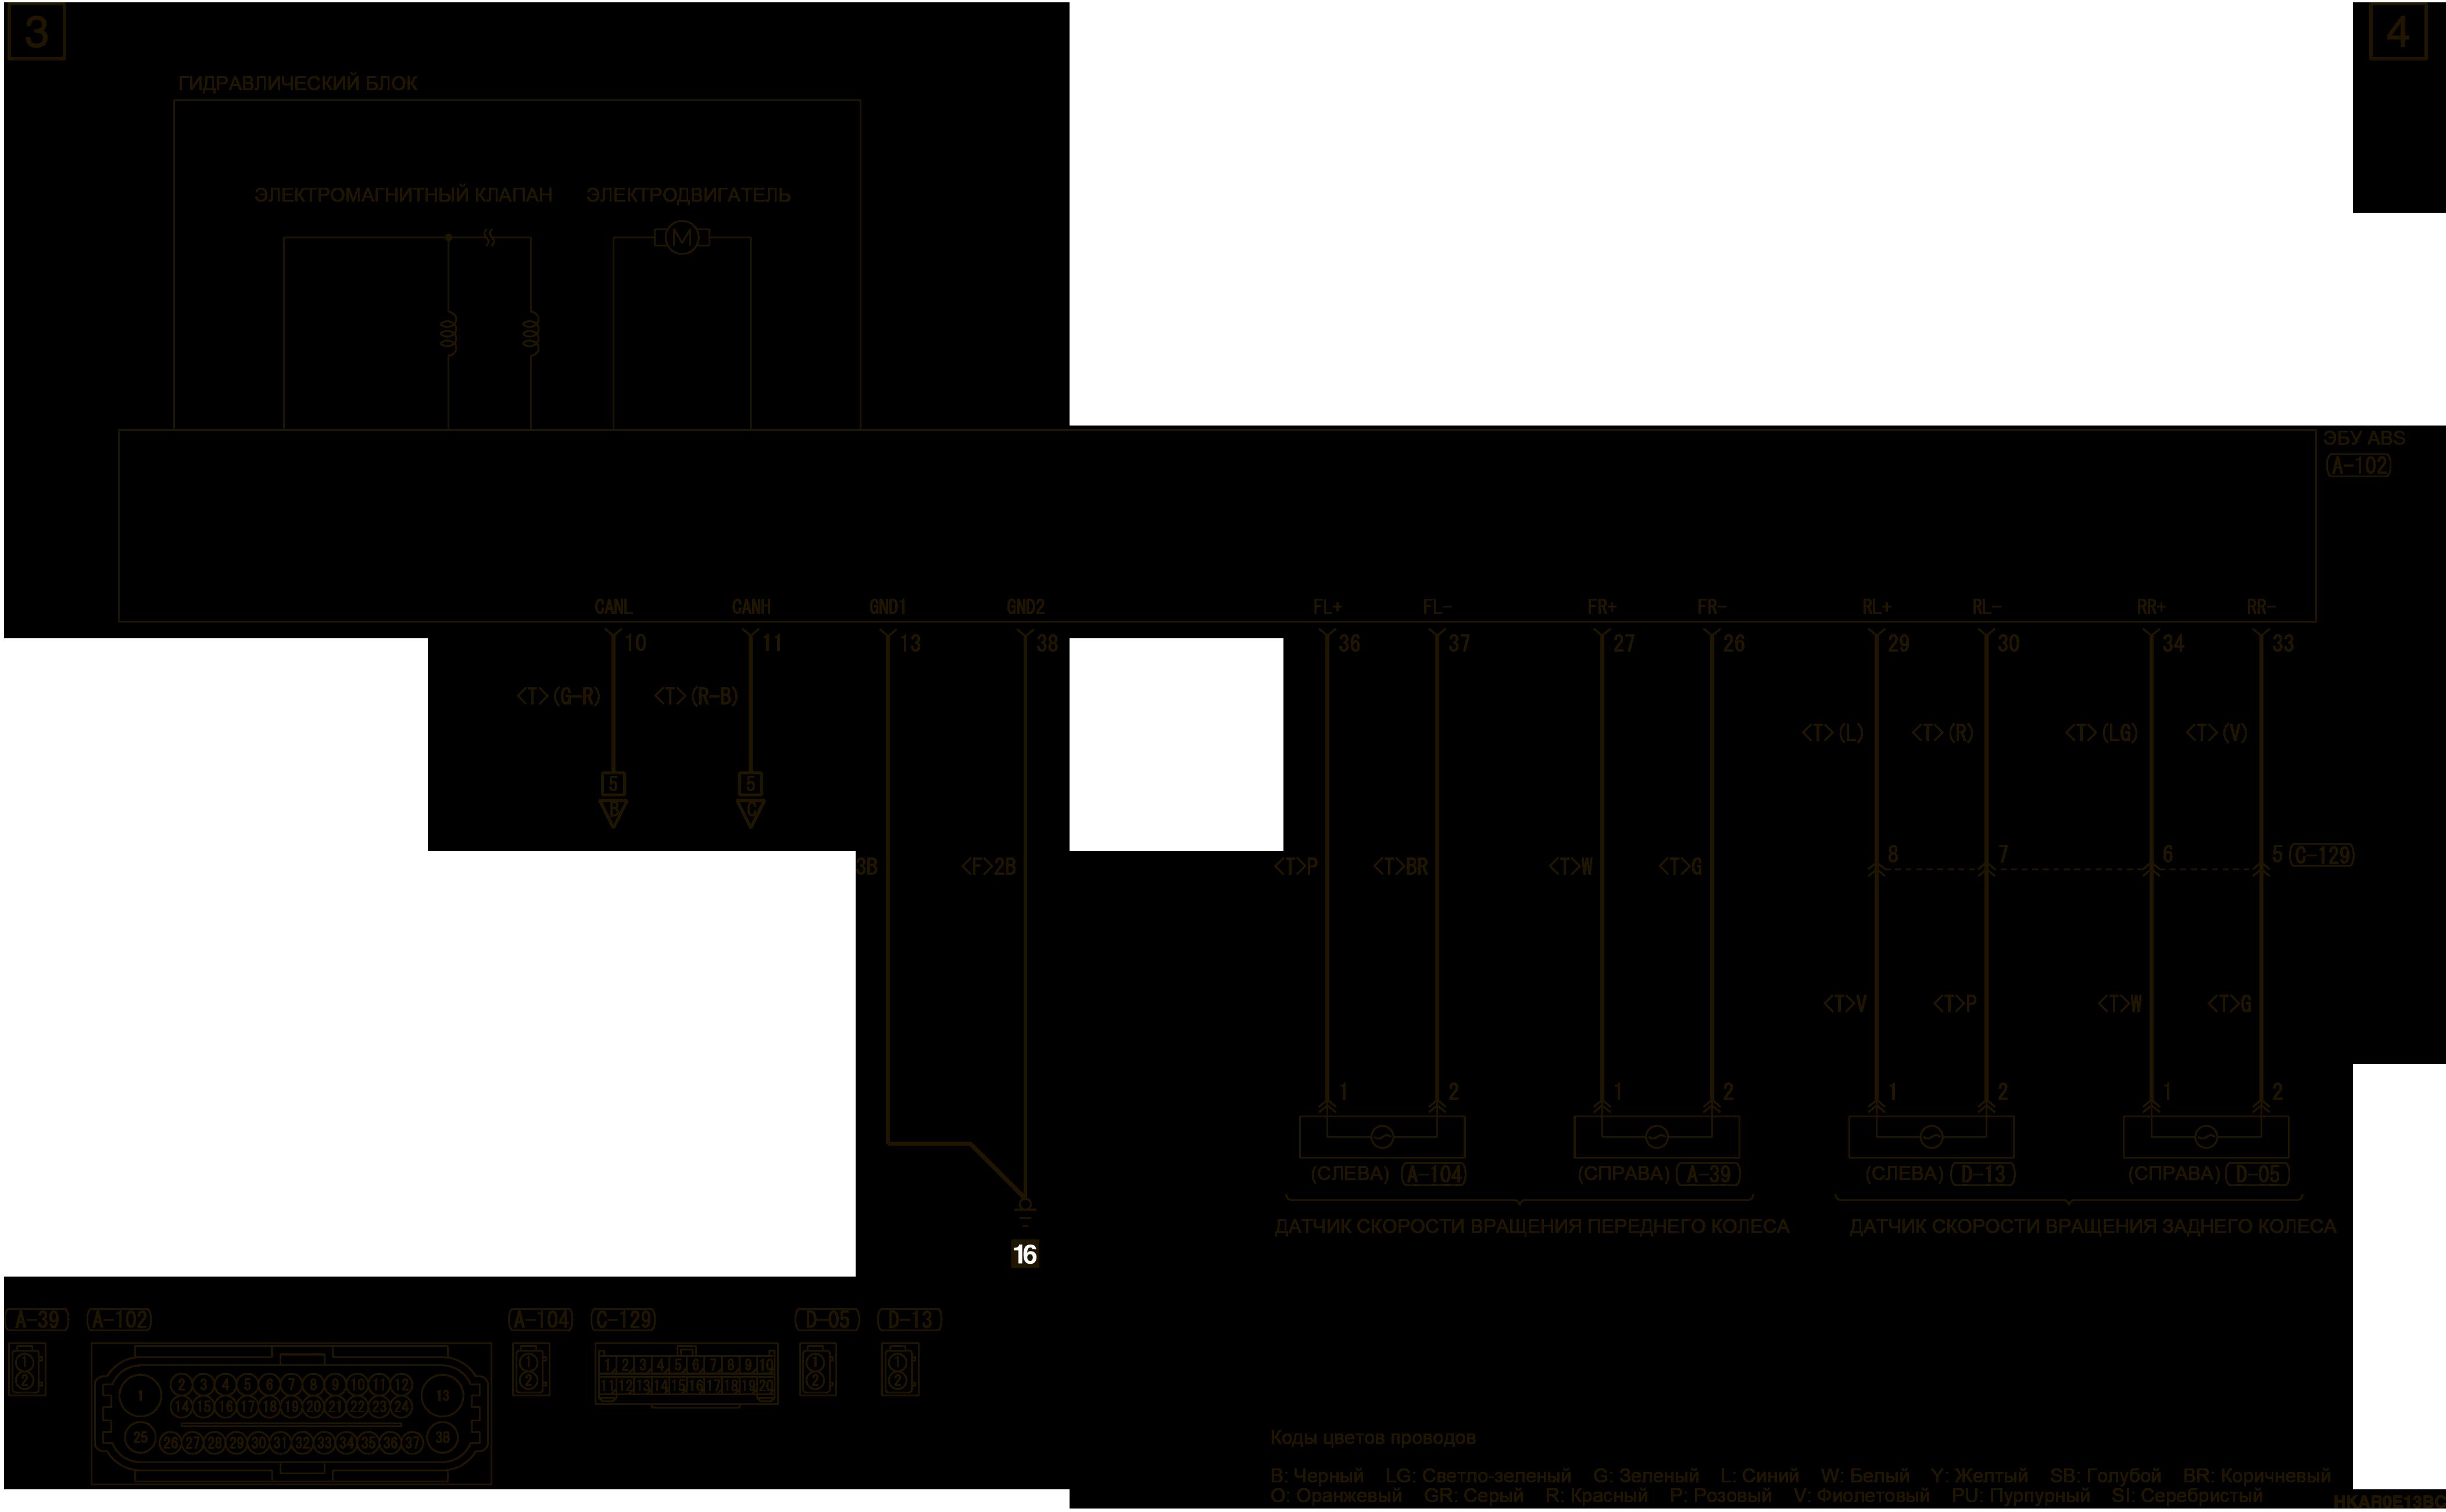 mmc аутлендер 3 2019 электросхемаАНТИБЛОКИРОВОЧНАЯ СИСТЕМА ТОРМОЗОВ (ABS)